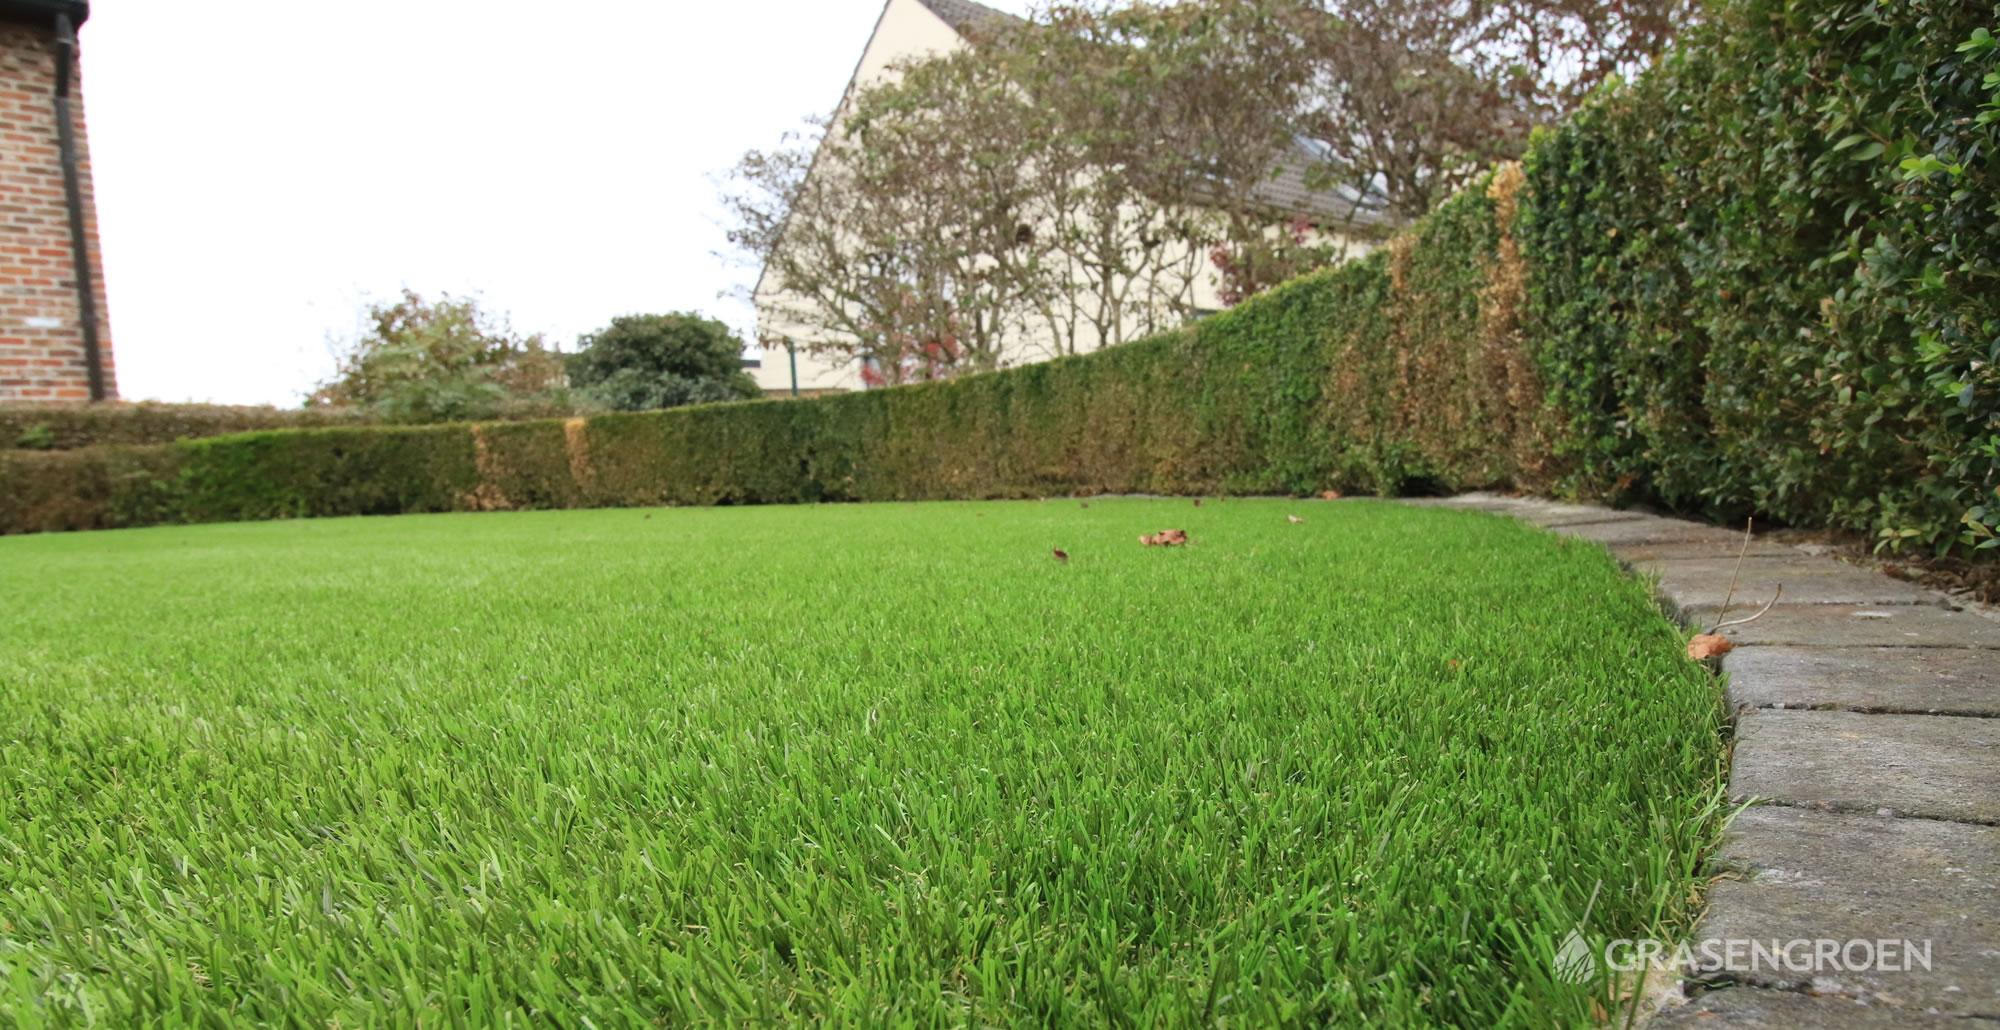 Kunstgrasleggenkermt17 • Gras en Groen Kunstgras